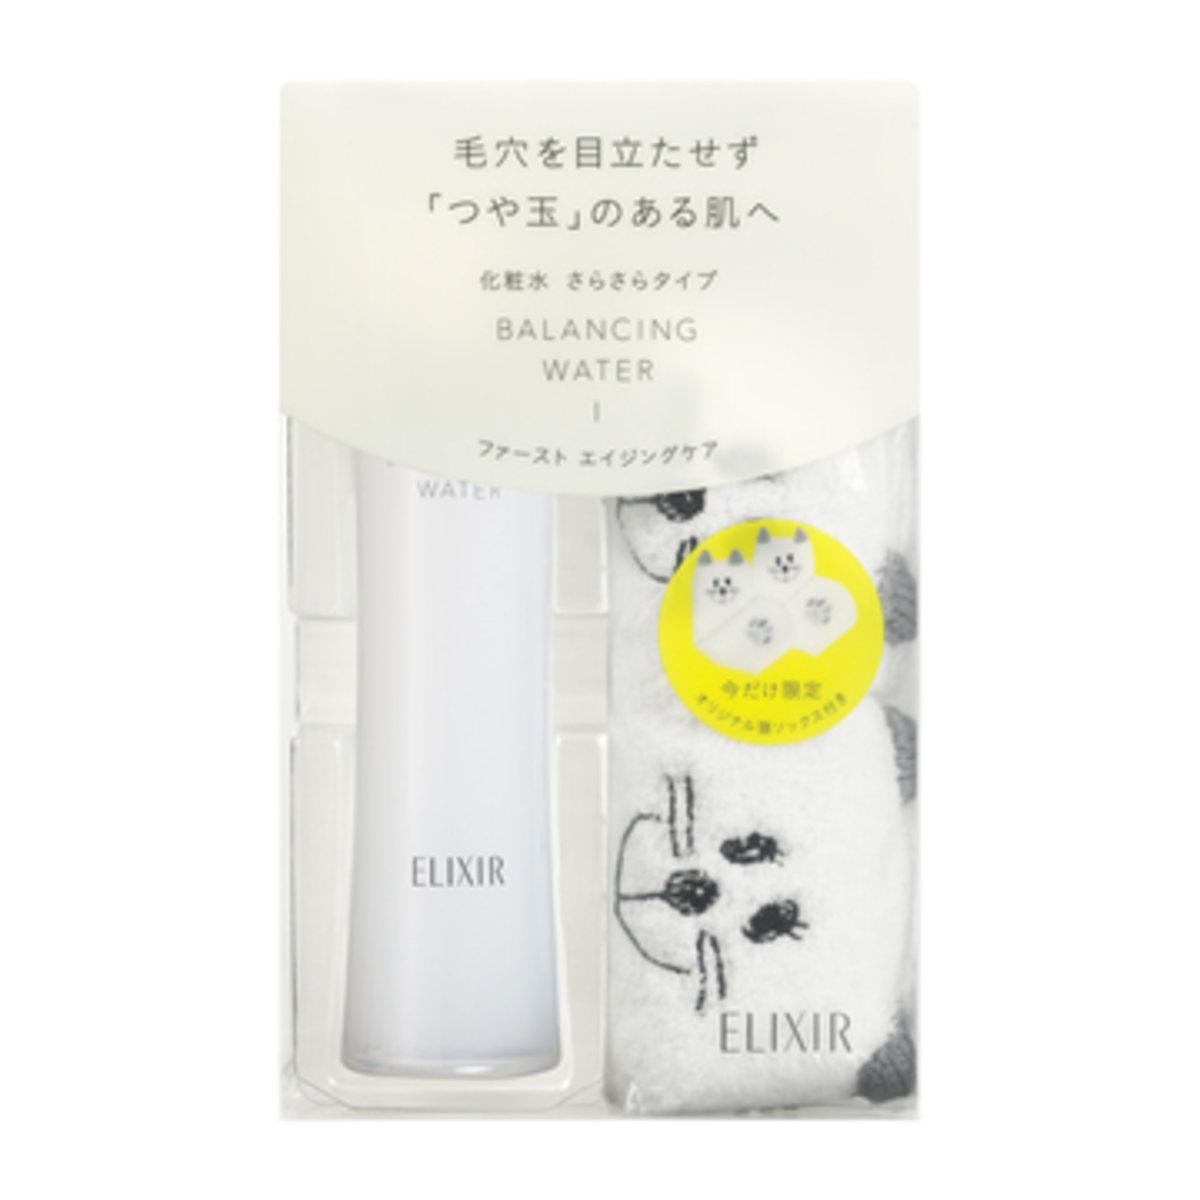 ELIXIR怡麗絲爾 平衡系列化妝水 (限定版襪子贈品)(I:清爽型)(平行進口)